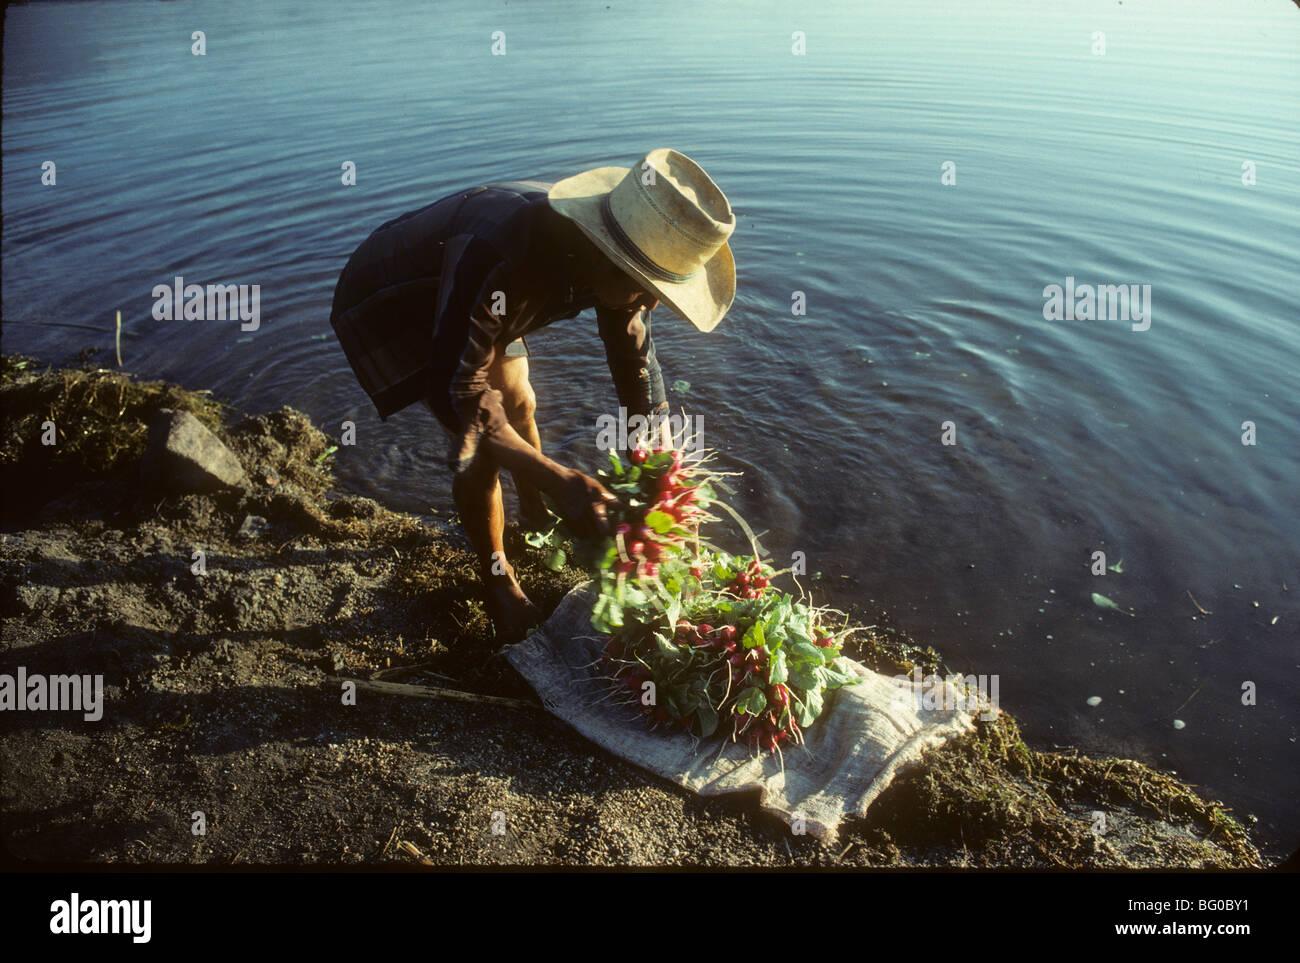 A farmer washes radishes in Lake Atitlan, near Santiago Atitlan, Guatemala - Stock Image